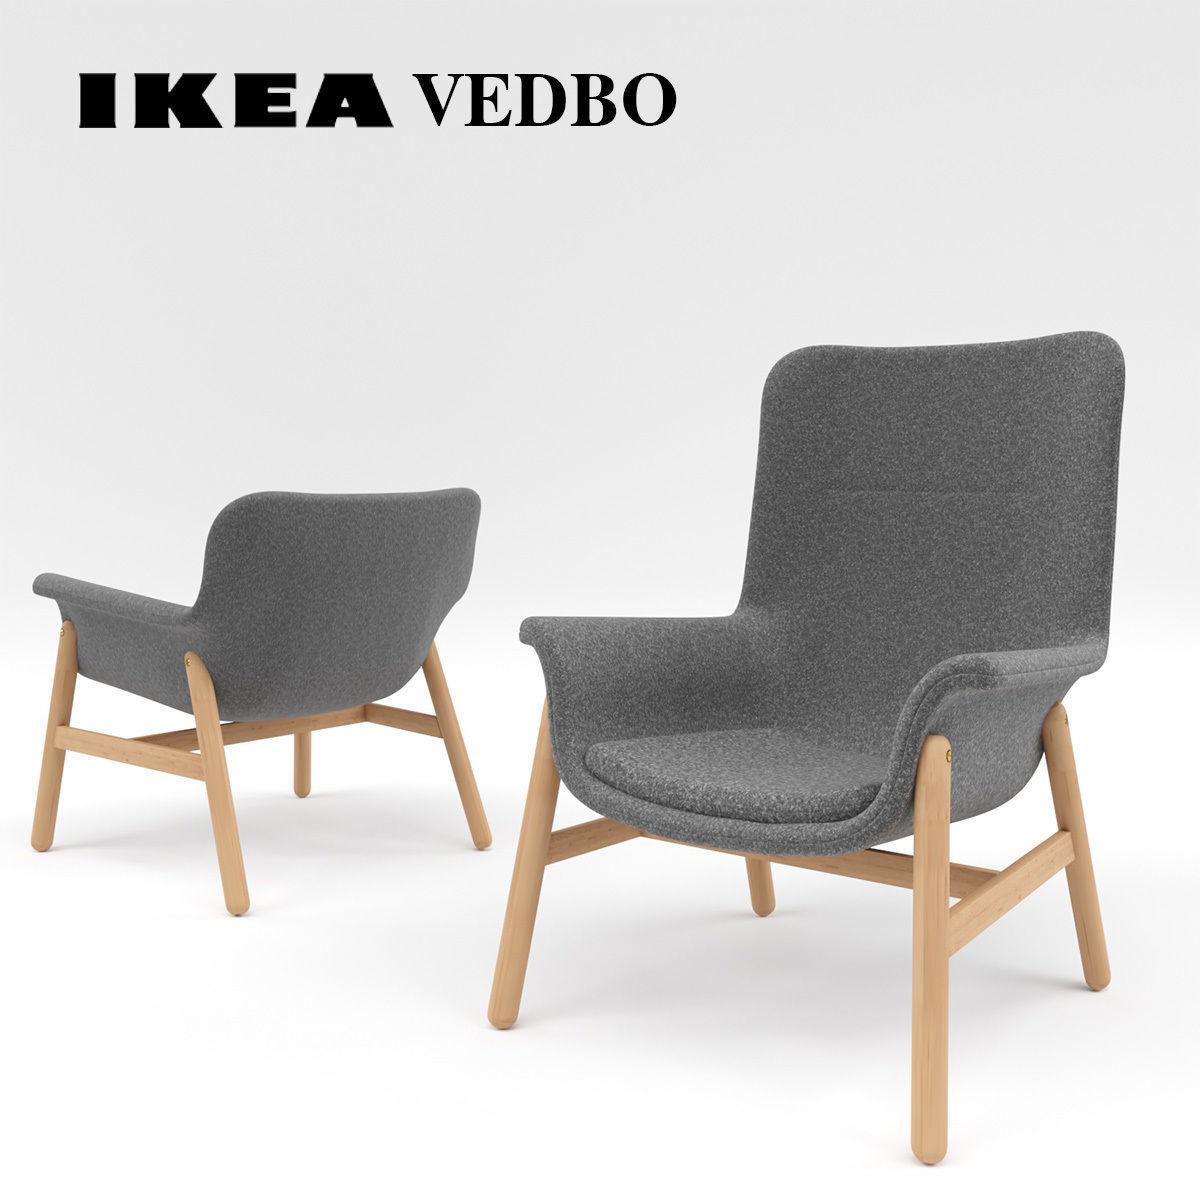 3d ikea vedbo high back armchair 3d model max obj mtl fbx mat 1